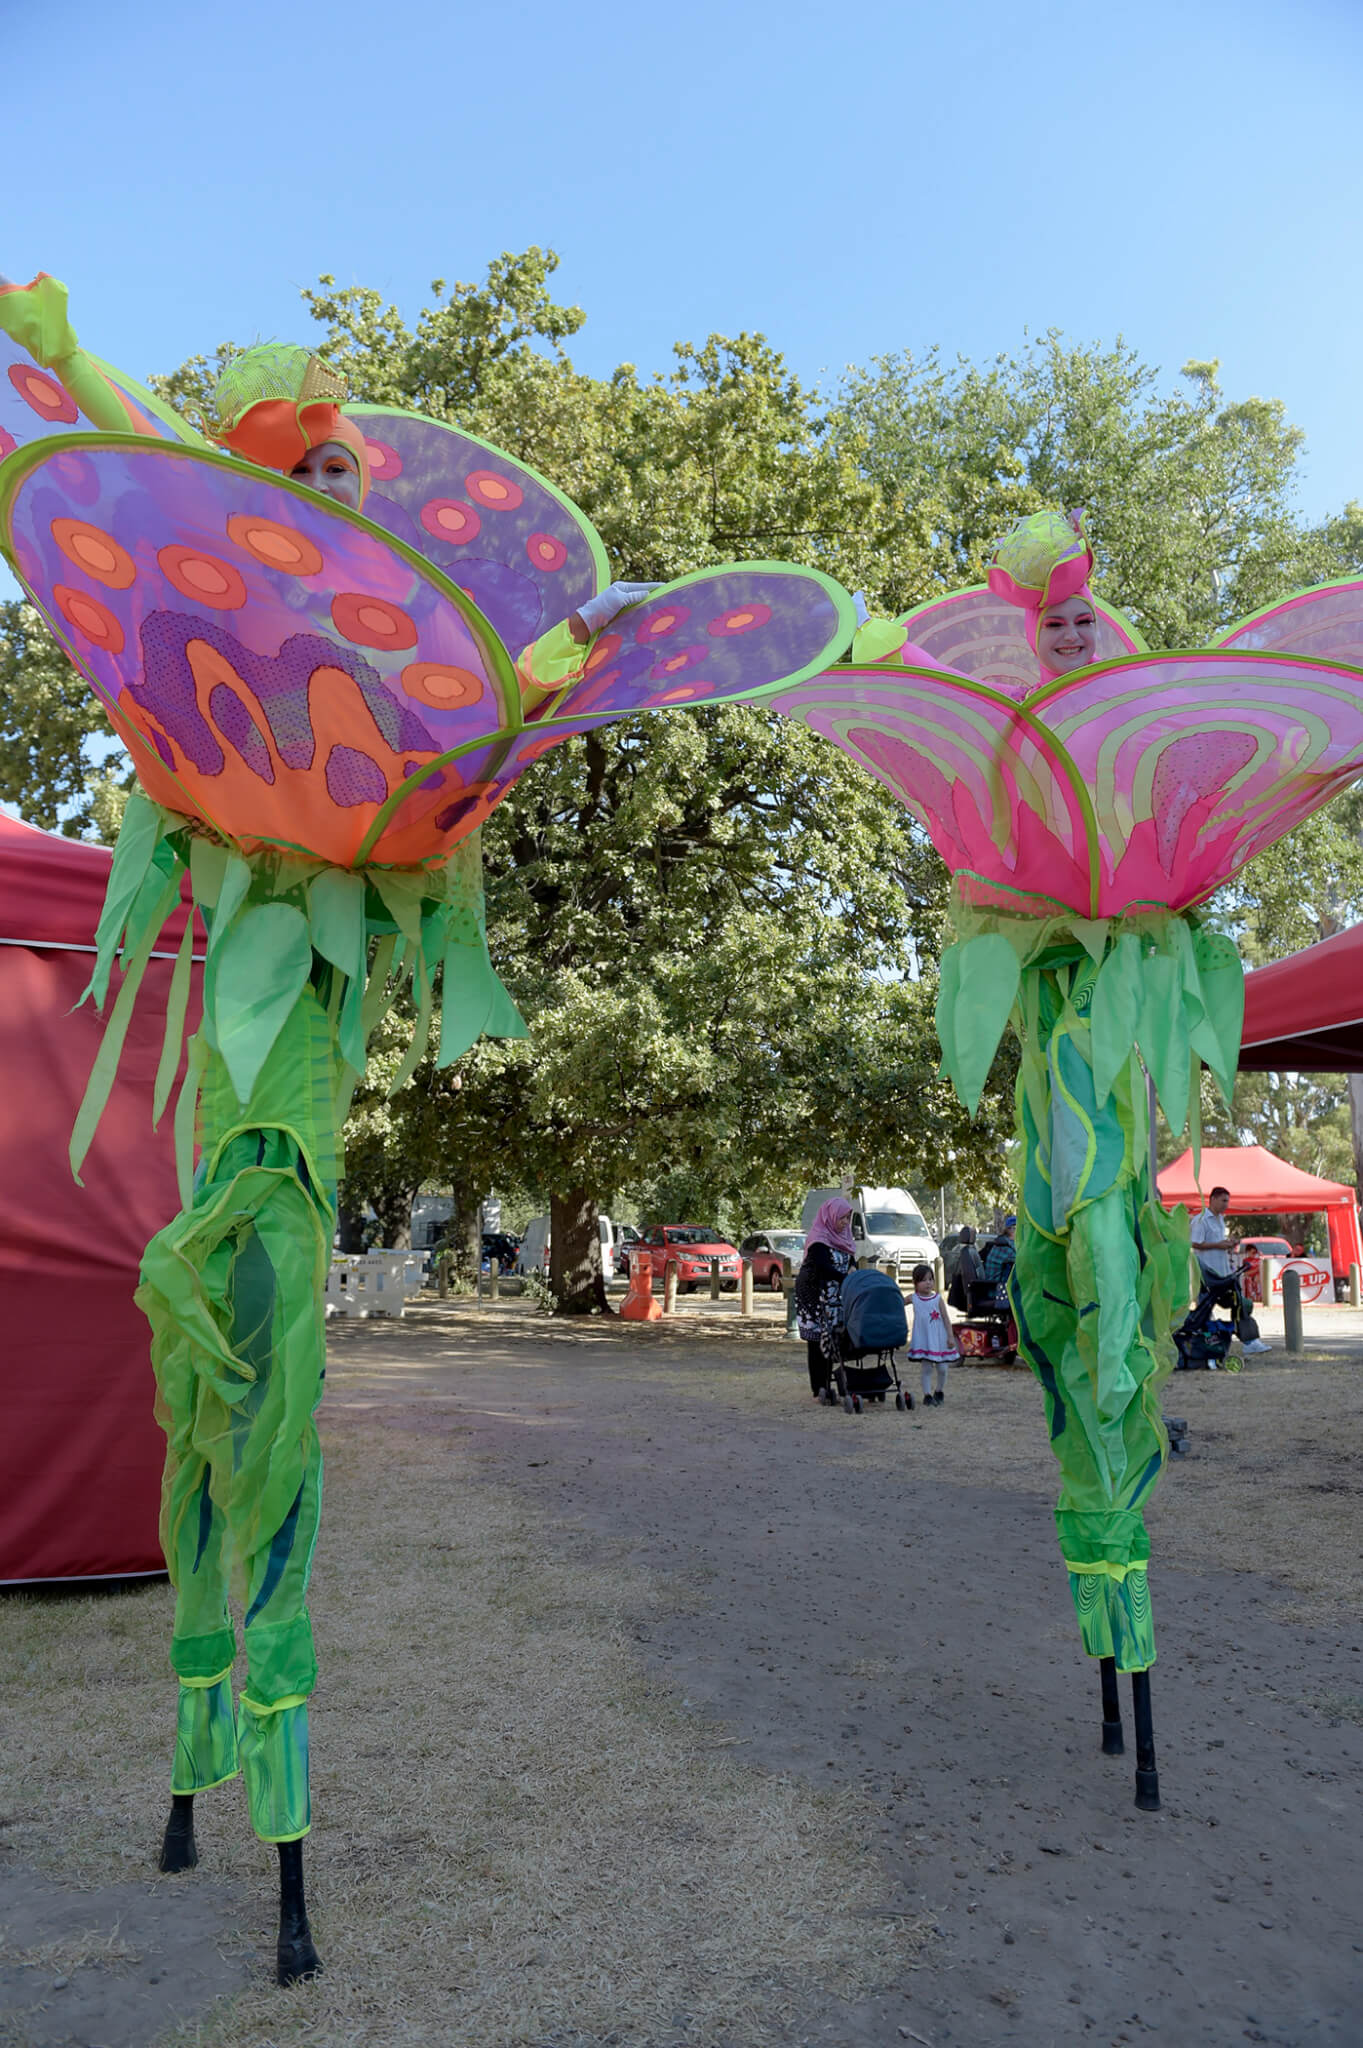 Flowers on Stilts